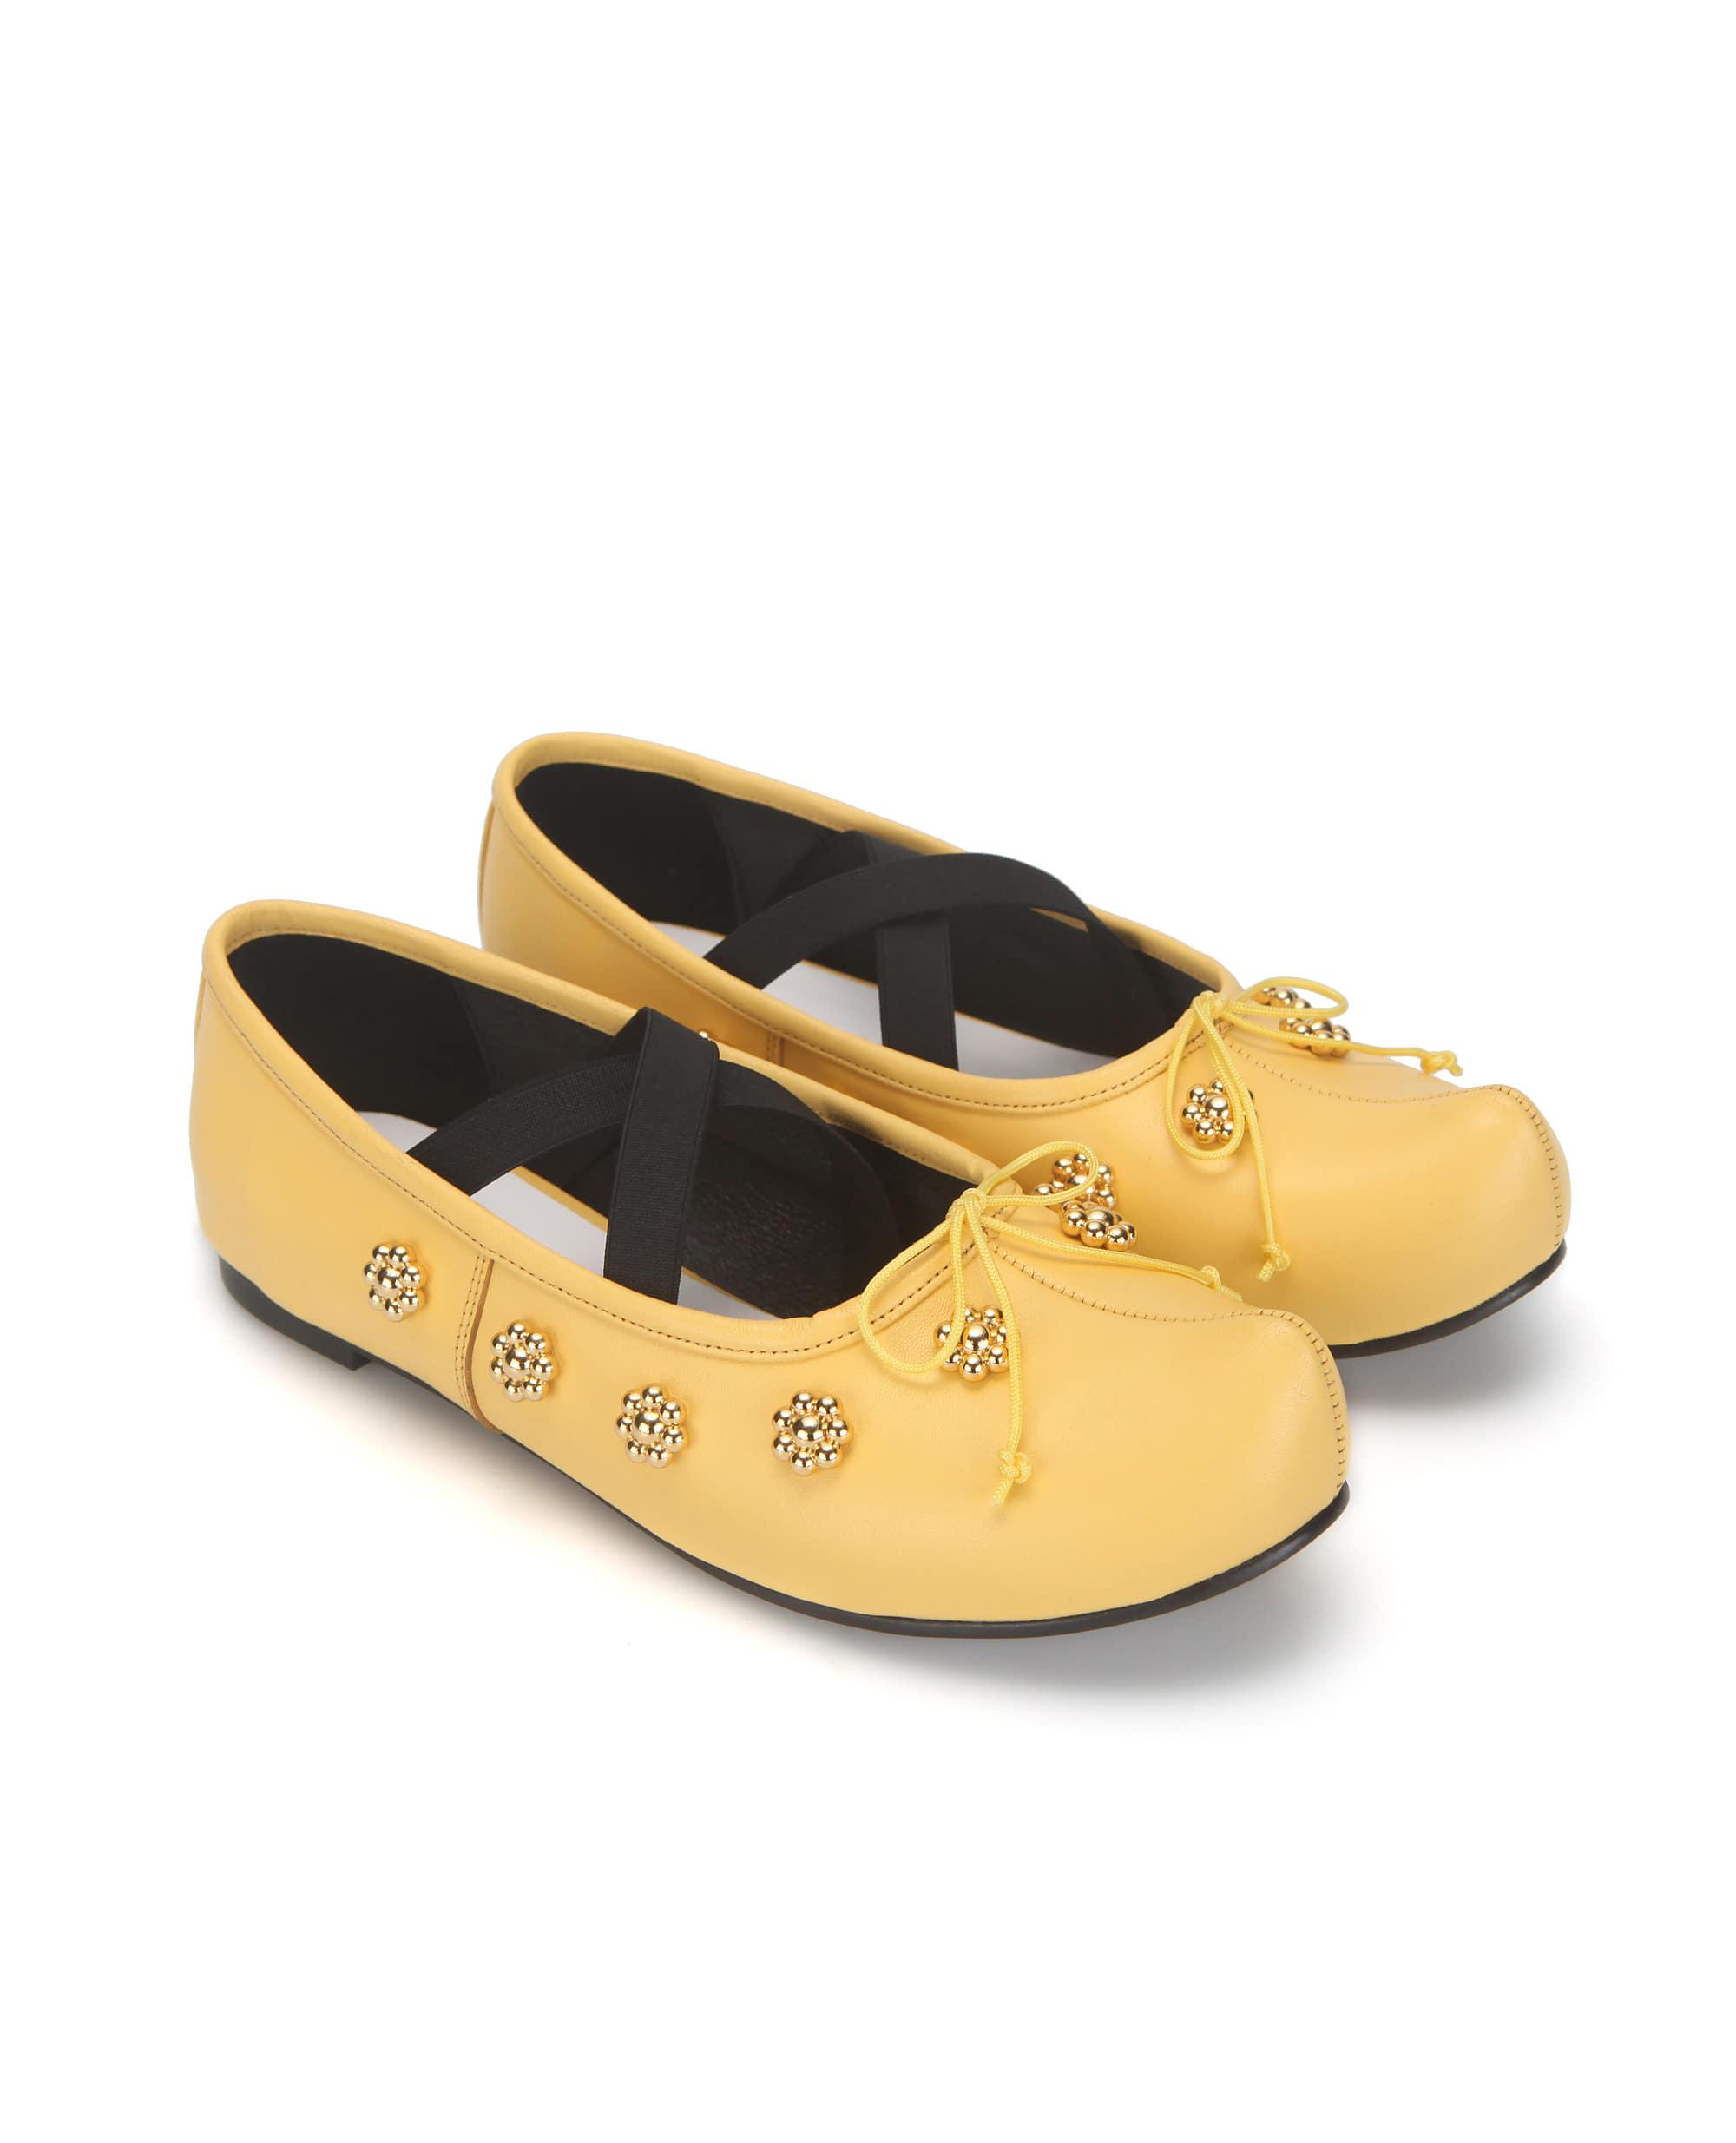 Pointed toe flower ballerinas | Yellow